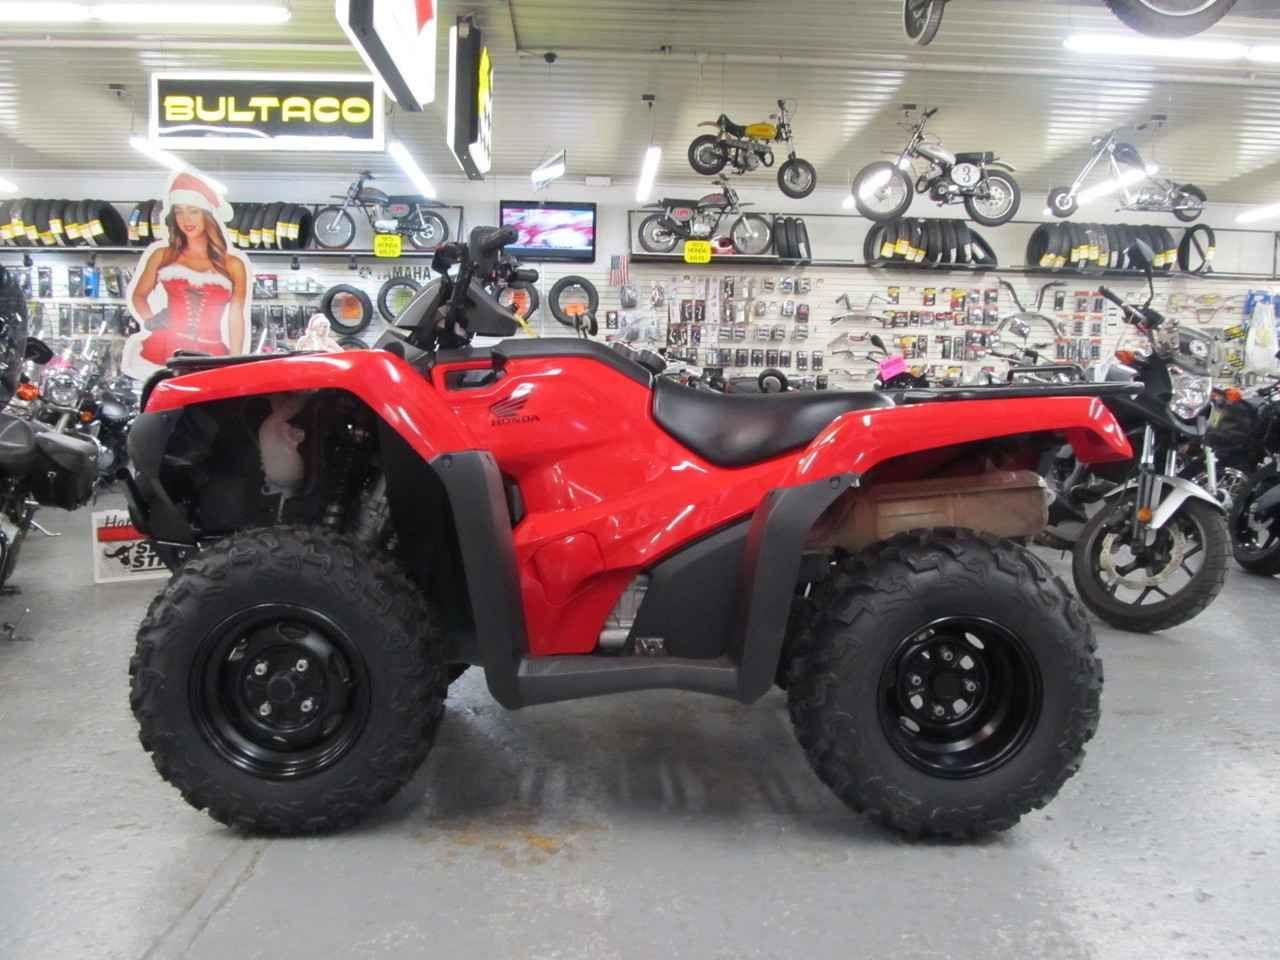 Used 2016 Honda TRX 420 FA ATVs For Sale in Colorado ...